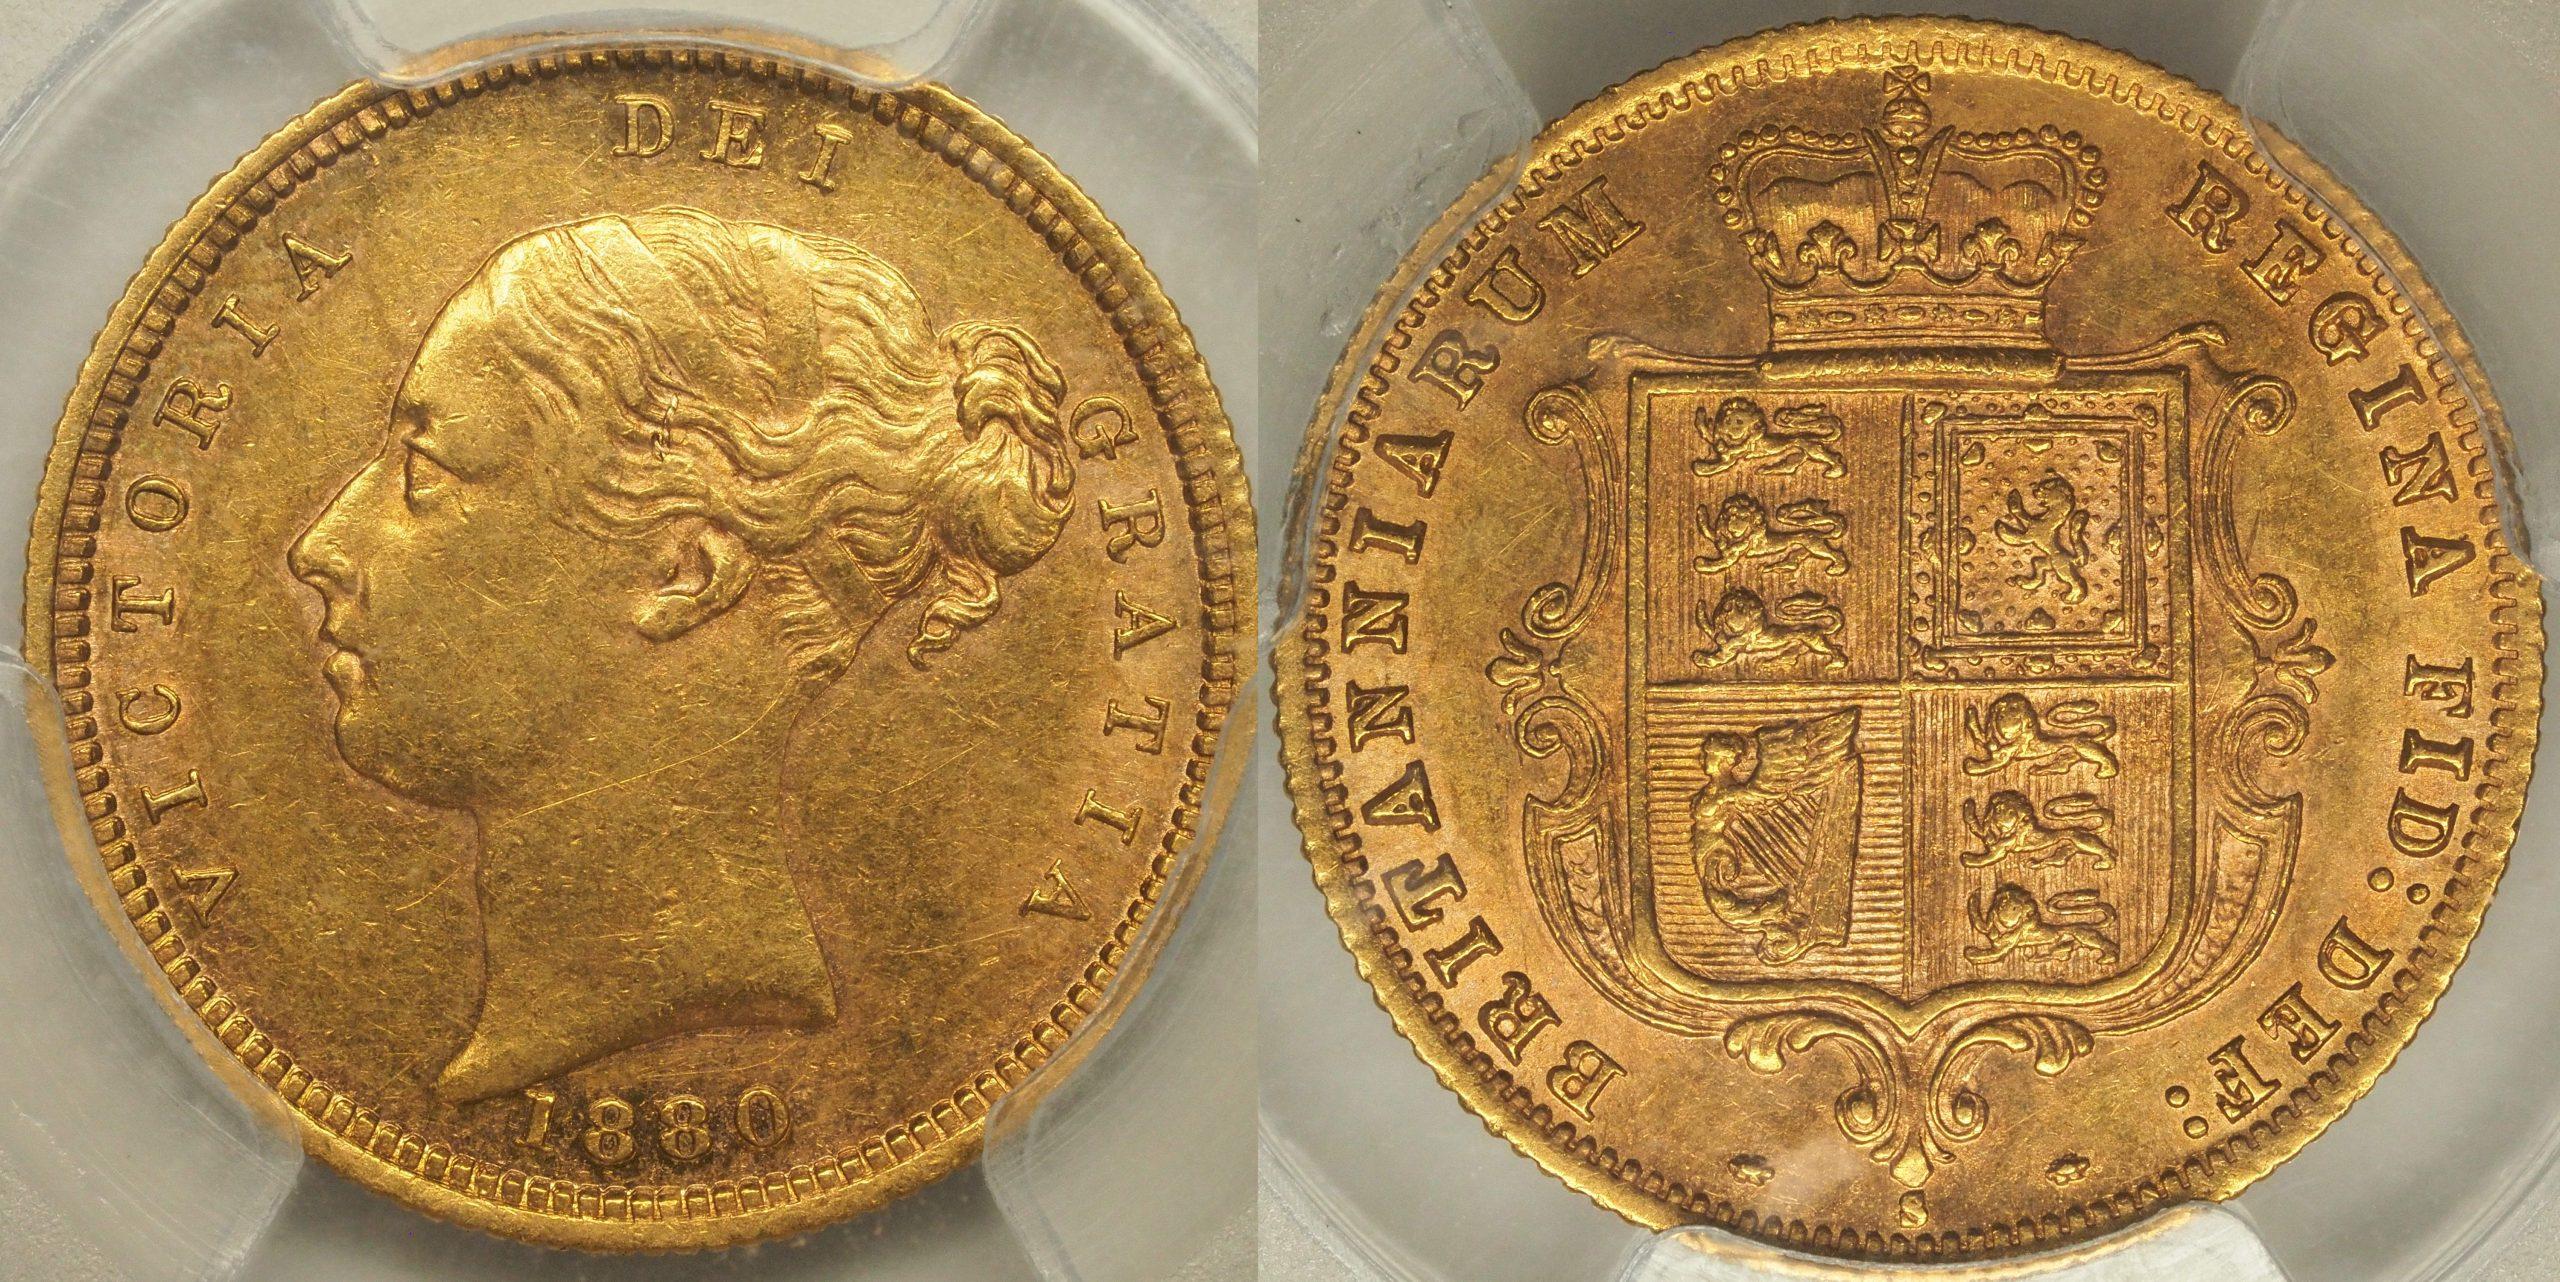 Australia 1880 Sydney Half Sovereign PCGS AU53